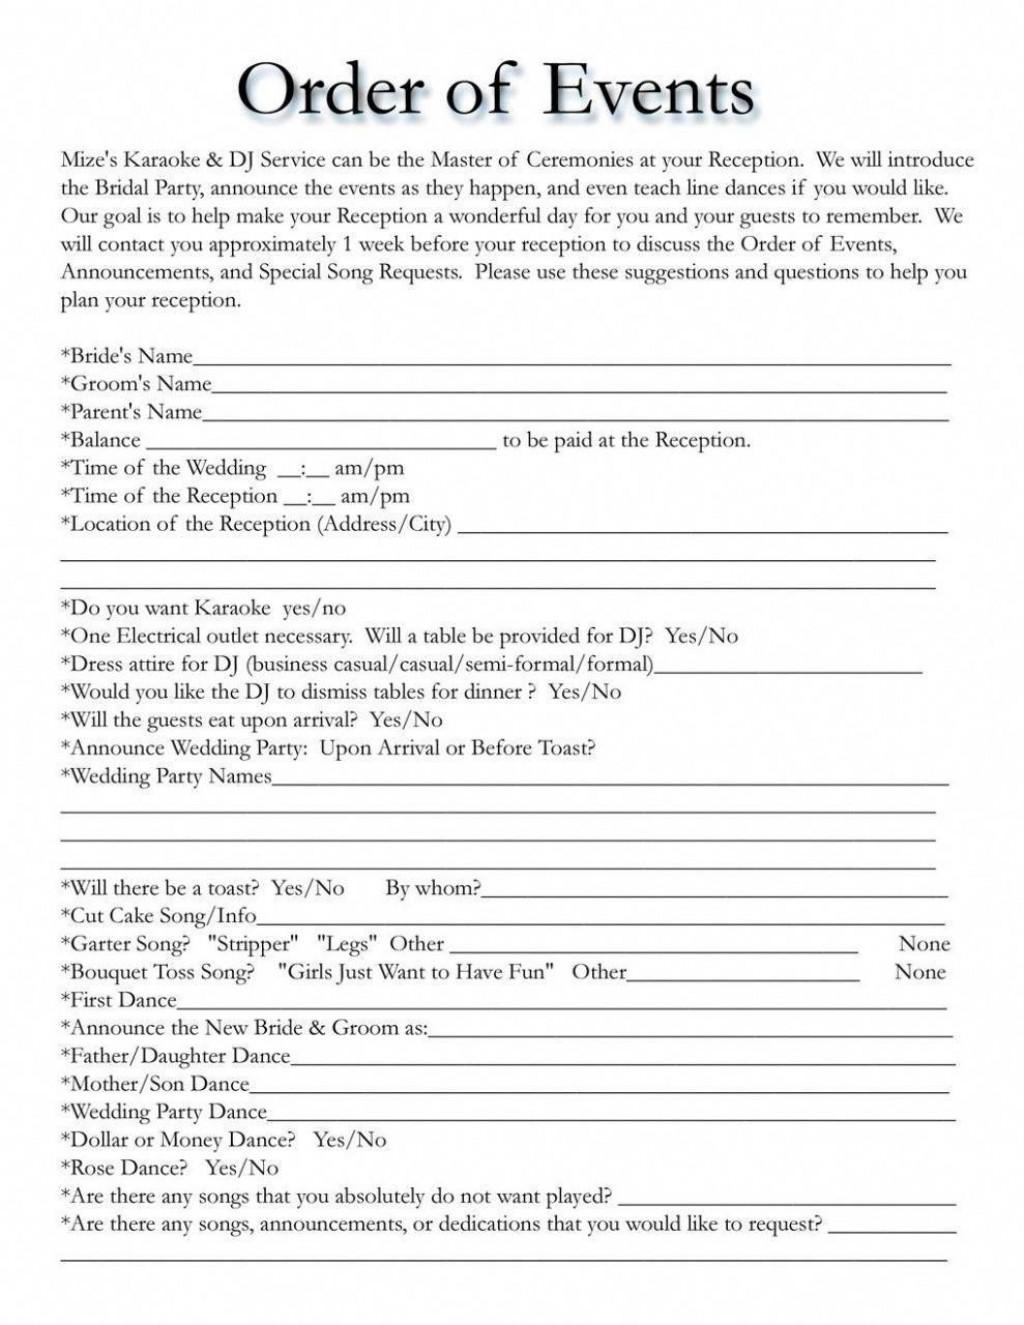 001 Unique Wedding Day Schedule Template Image  Excel Editable Timeline Free WordLarge